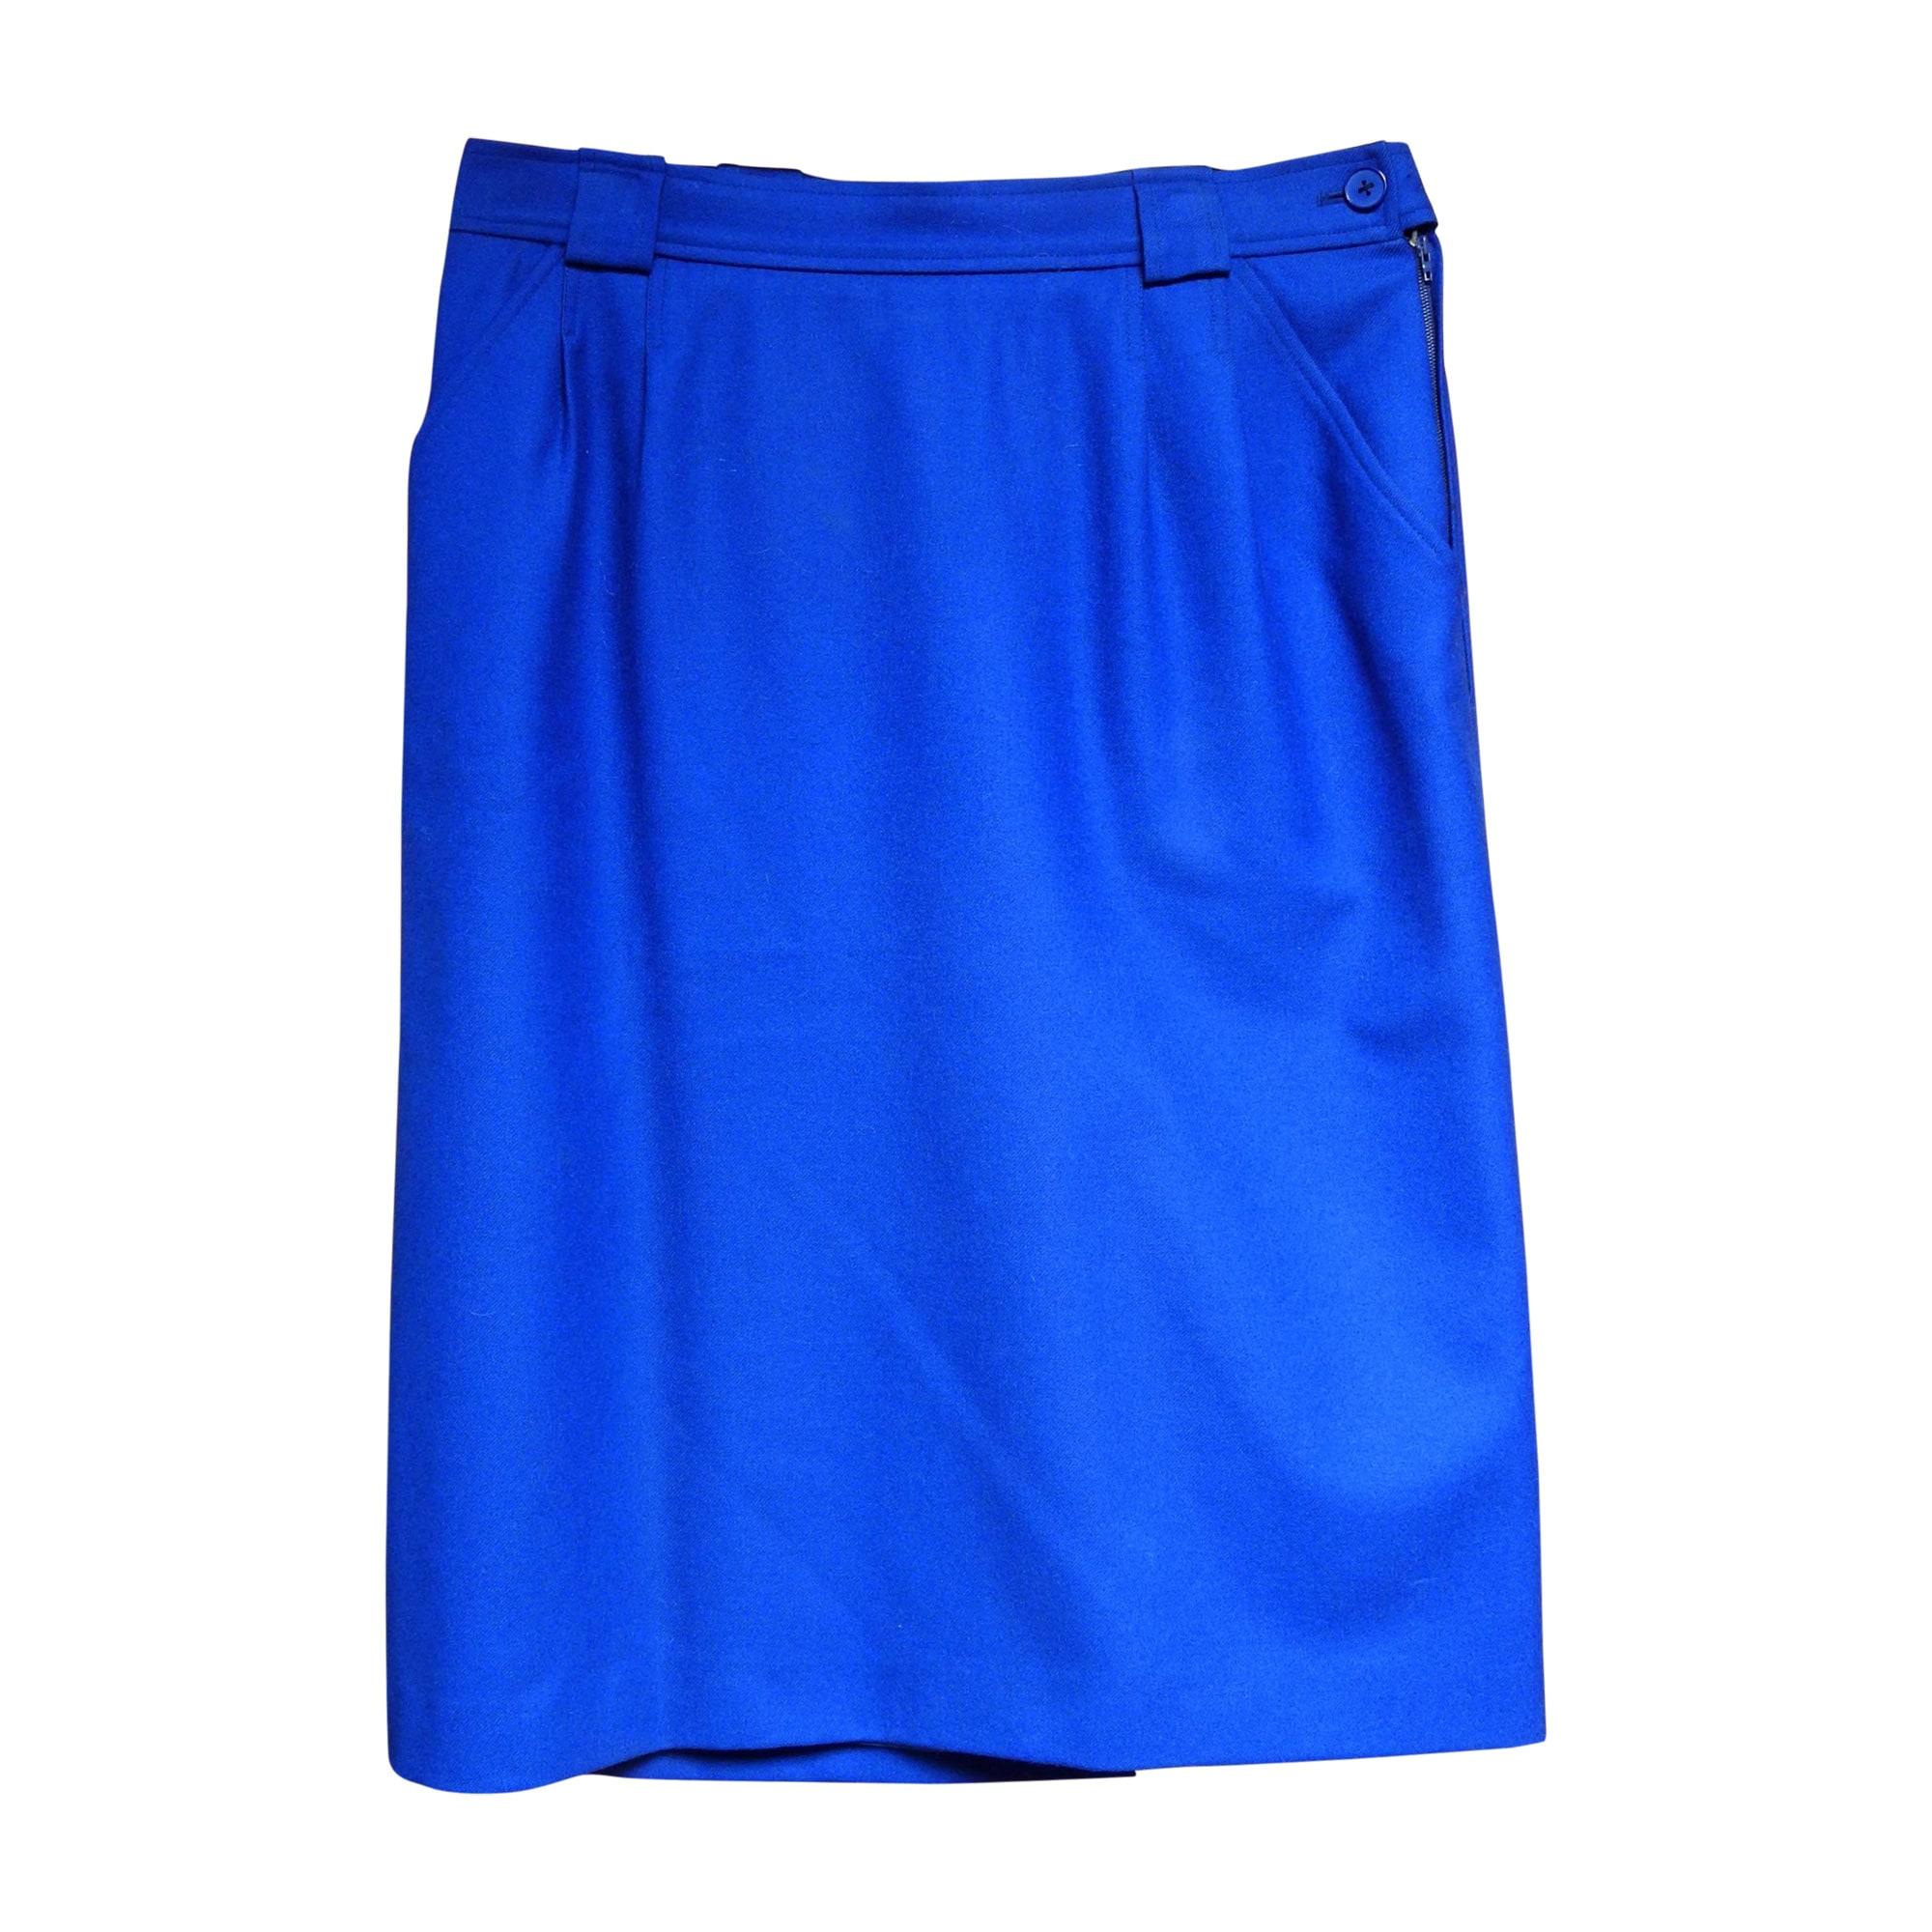 Jupe mi-longue YVES SAINT LAURENT Bleu, bleu marine, bleu turquoise